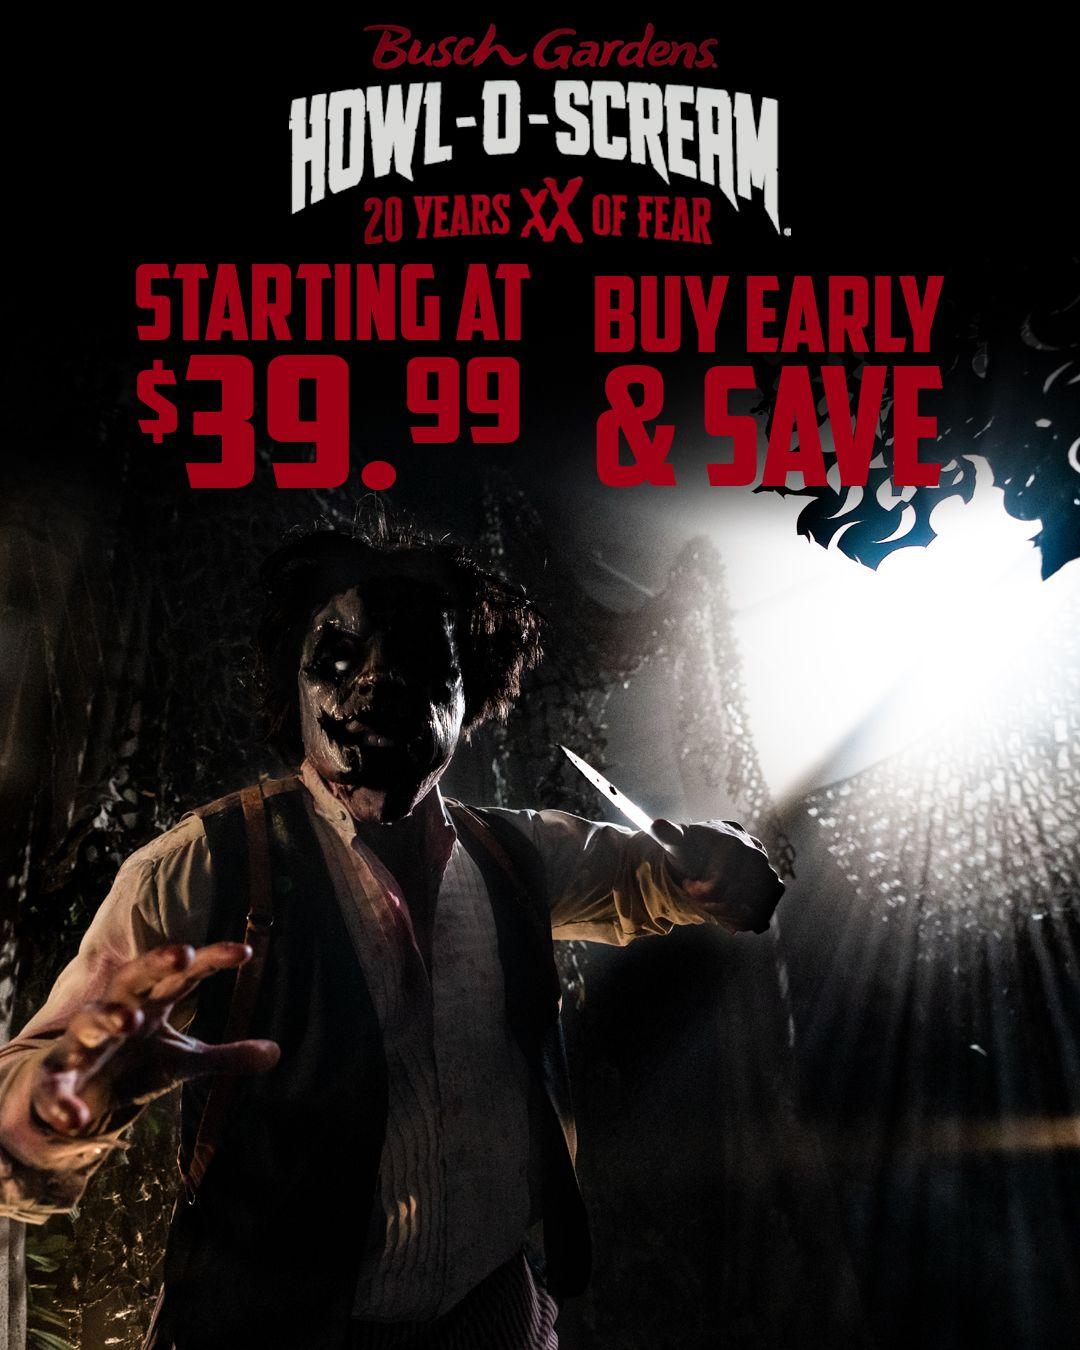 e08e28f49db2f60b63b57177de988902 - Busch Gardens Tampa Howl O Scream Ticket Prices